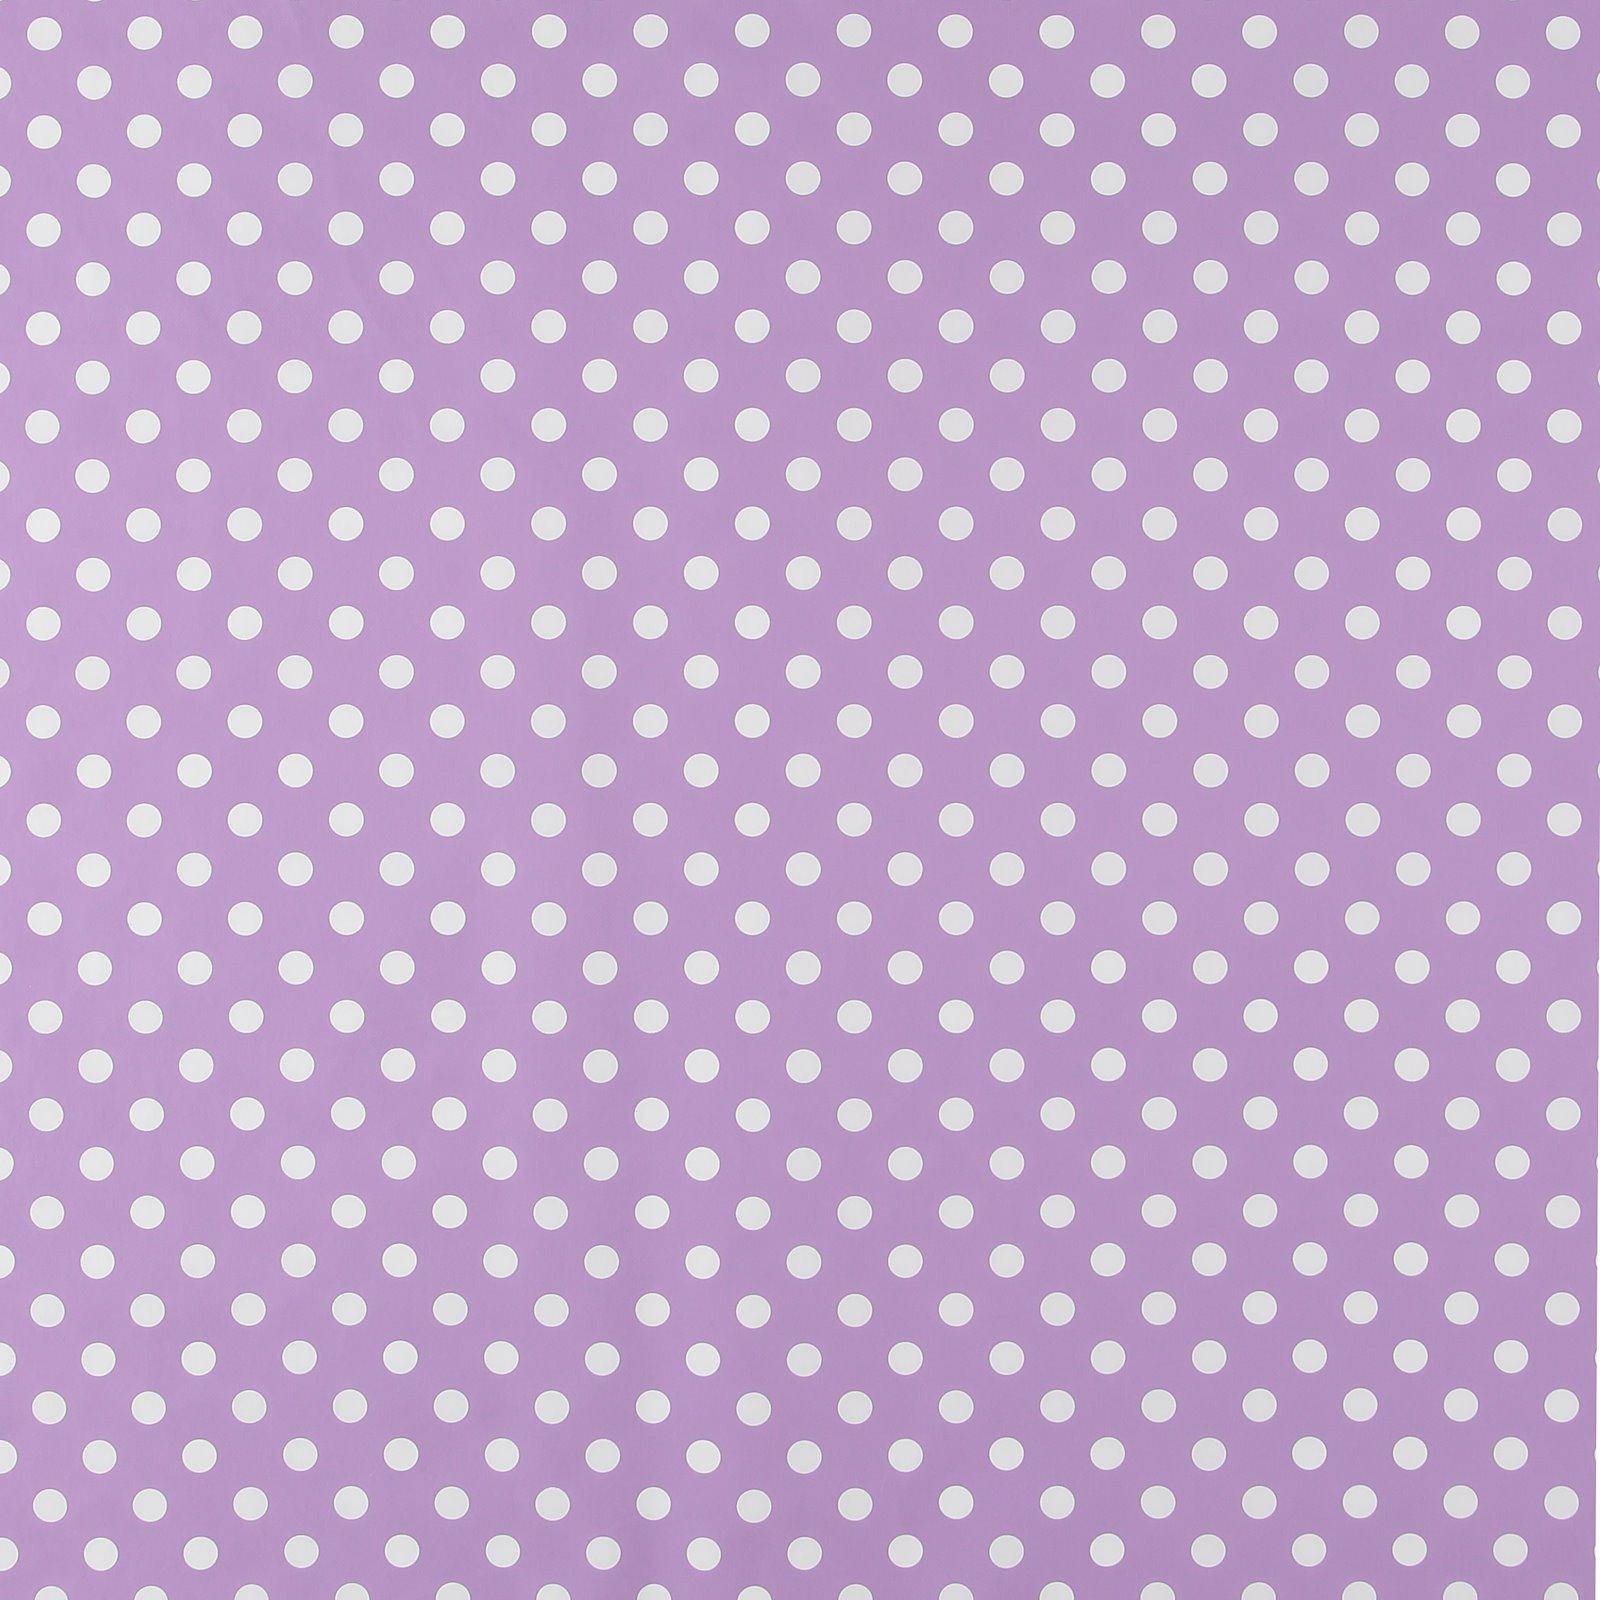 Non-woven oilcloth purple w white dots 866118_pack_sp